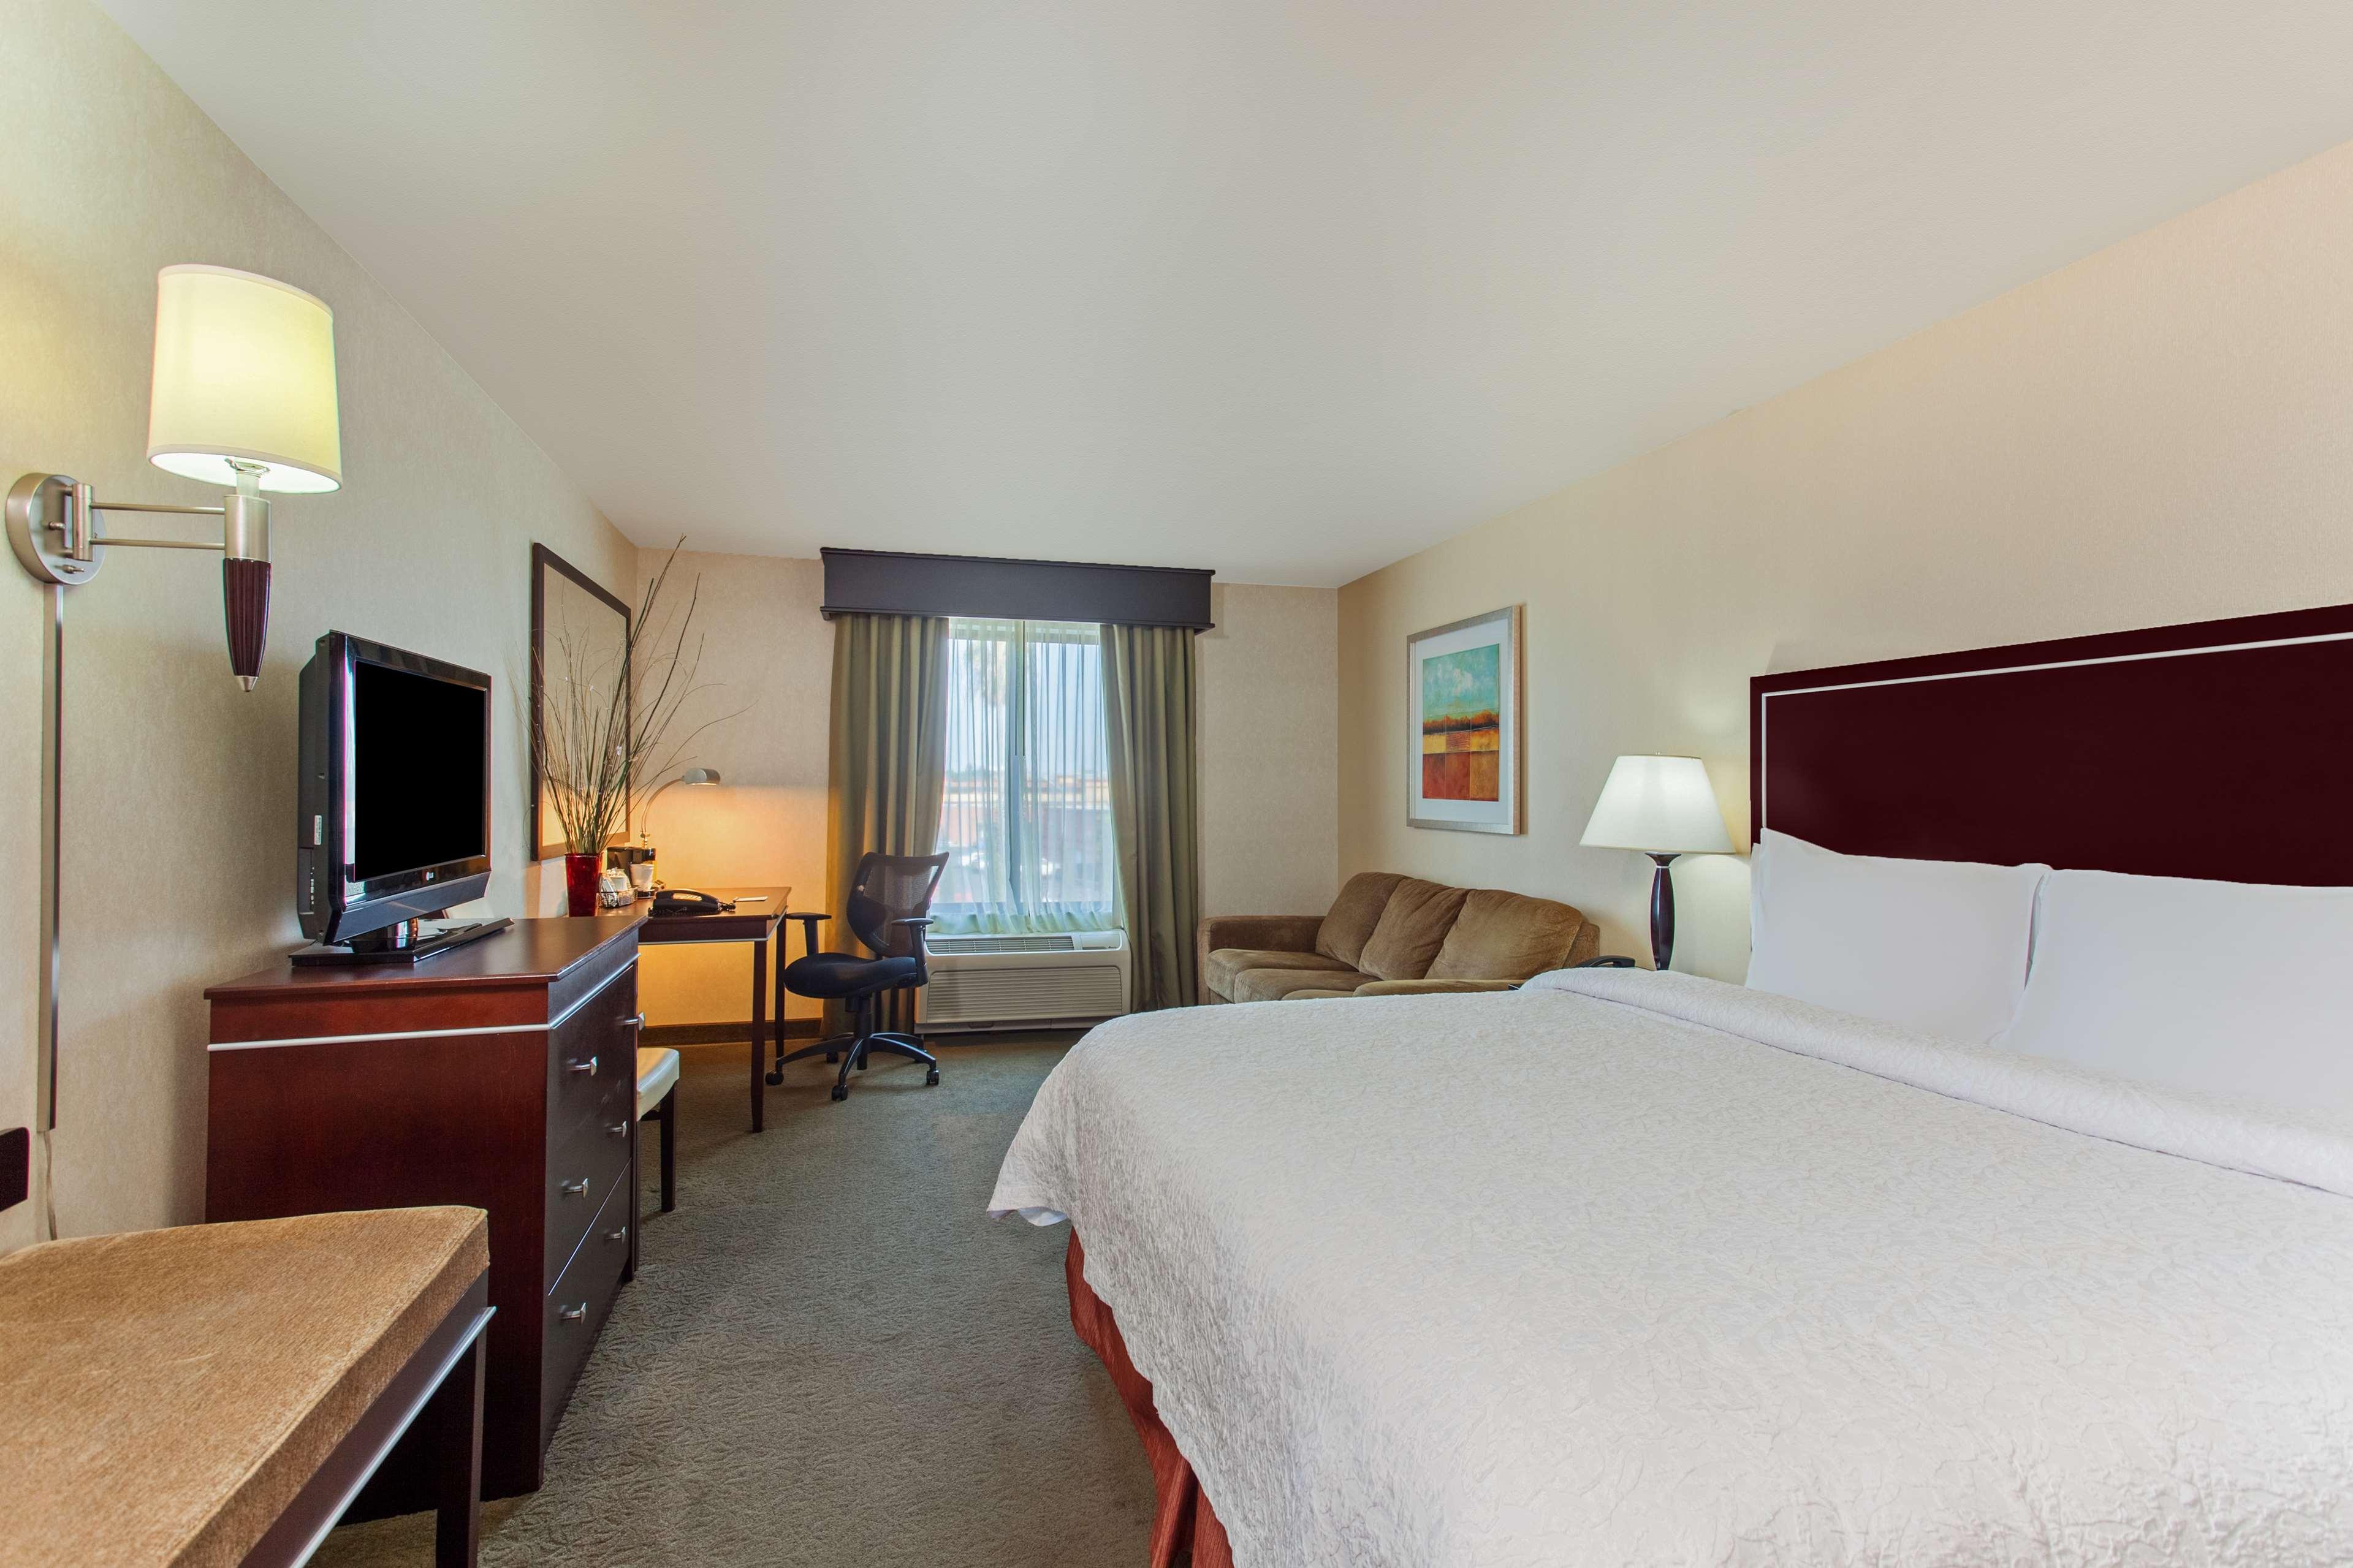 Hampton Inn & Suites Roseville image 11